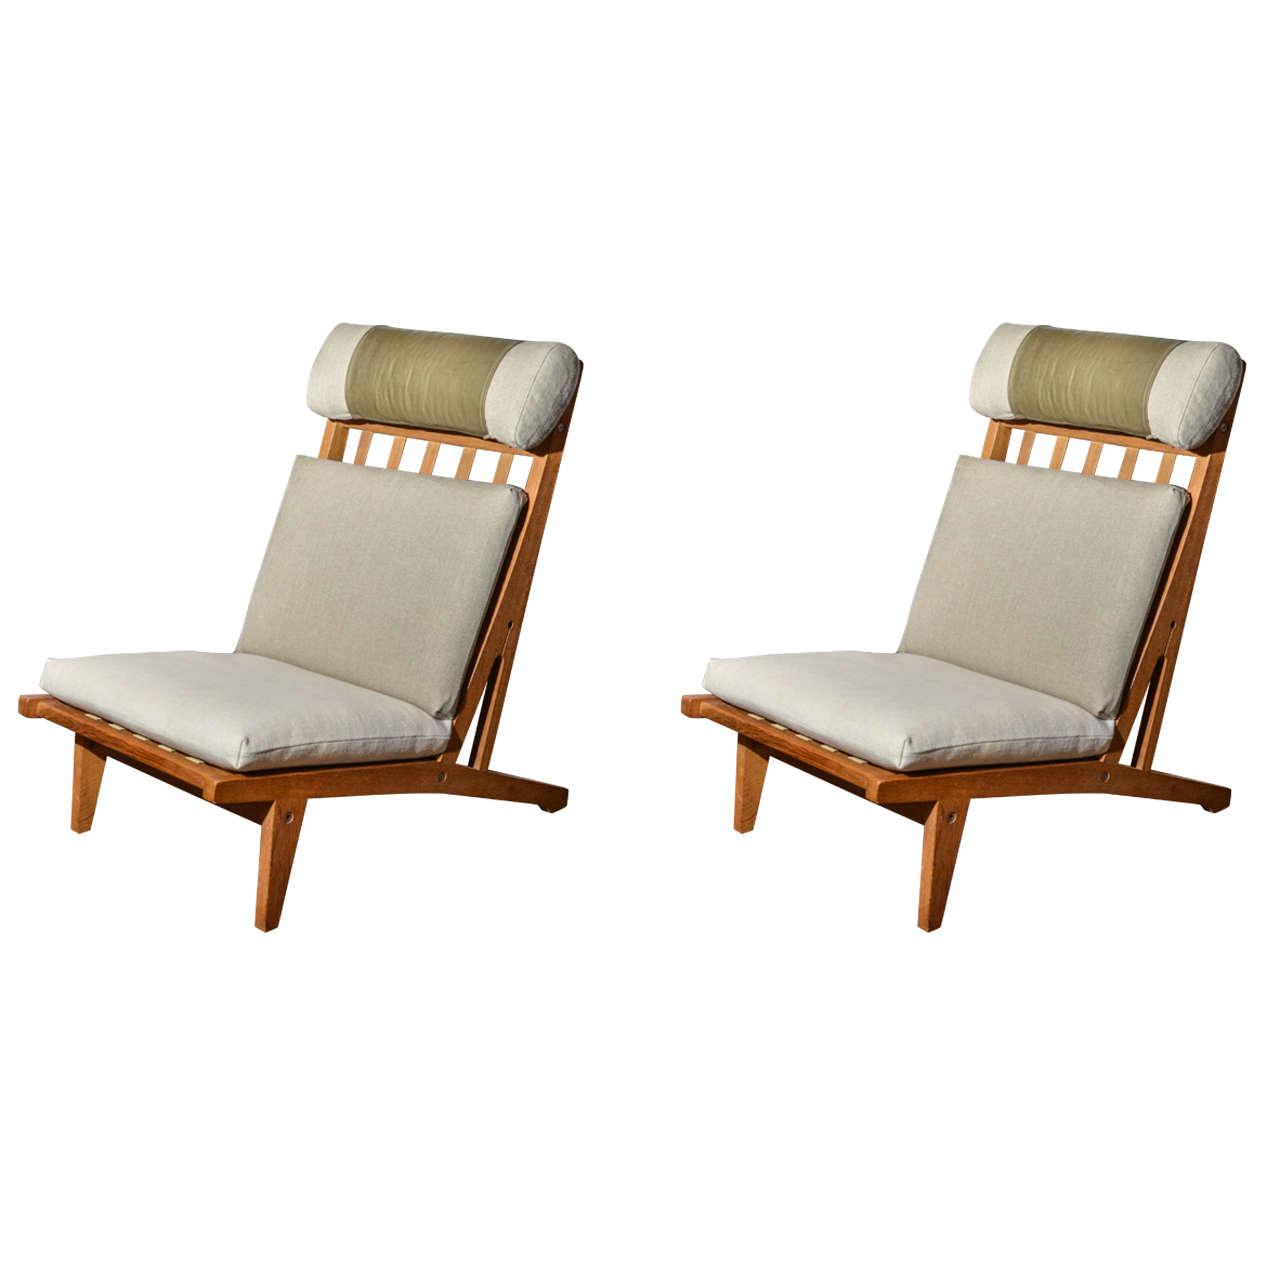 Mid Century Danish Deck Chair By Hans Wegner At 1stdibs